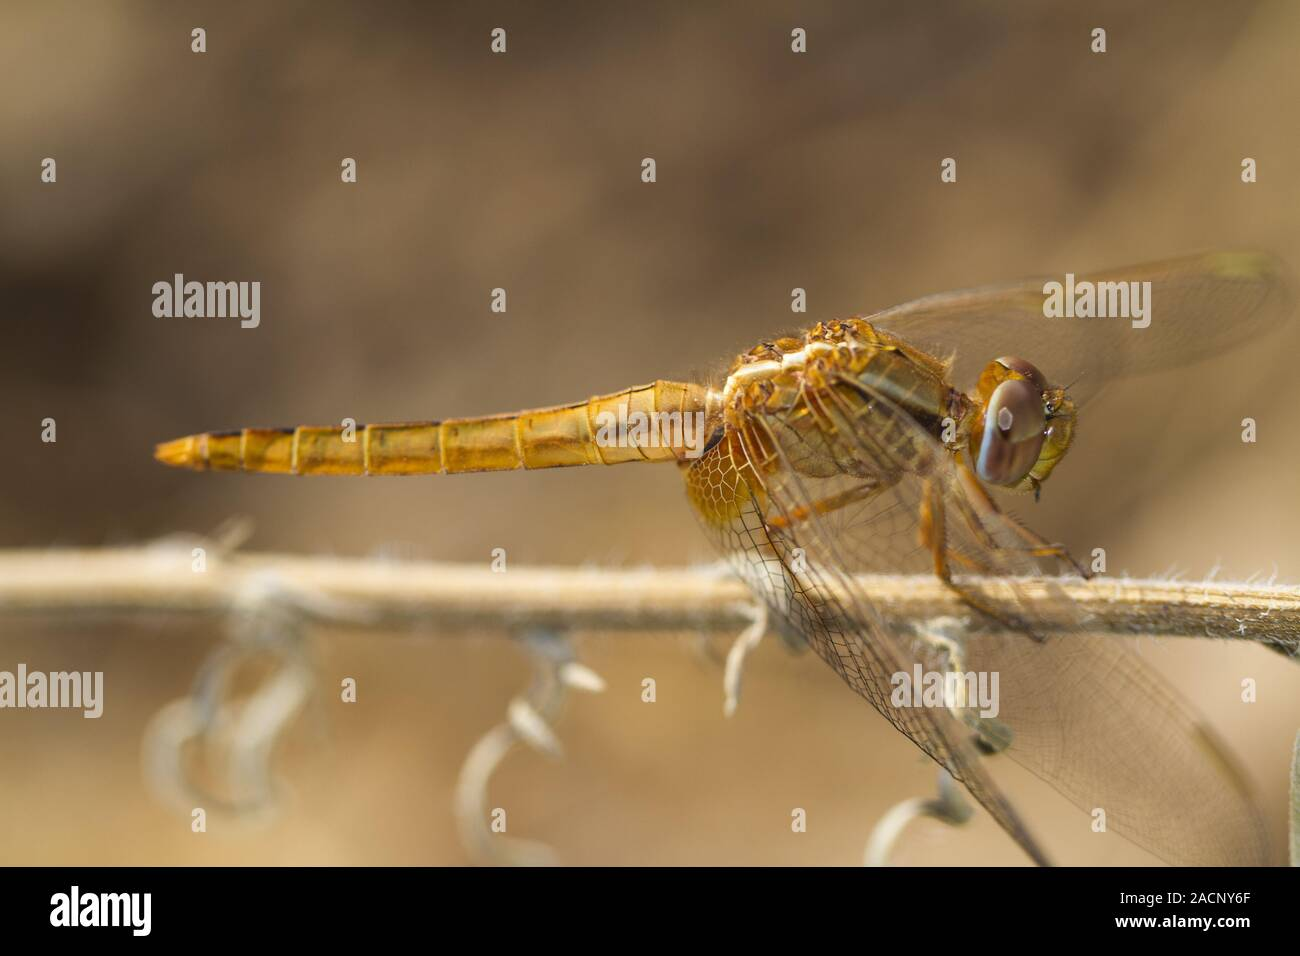 scarlet darter (Crocothemis erythraea) dragonfly Stock Photo